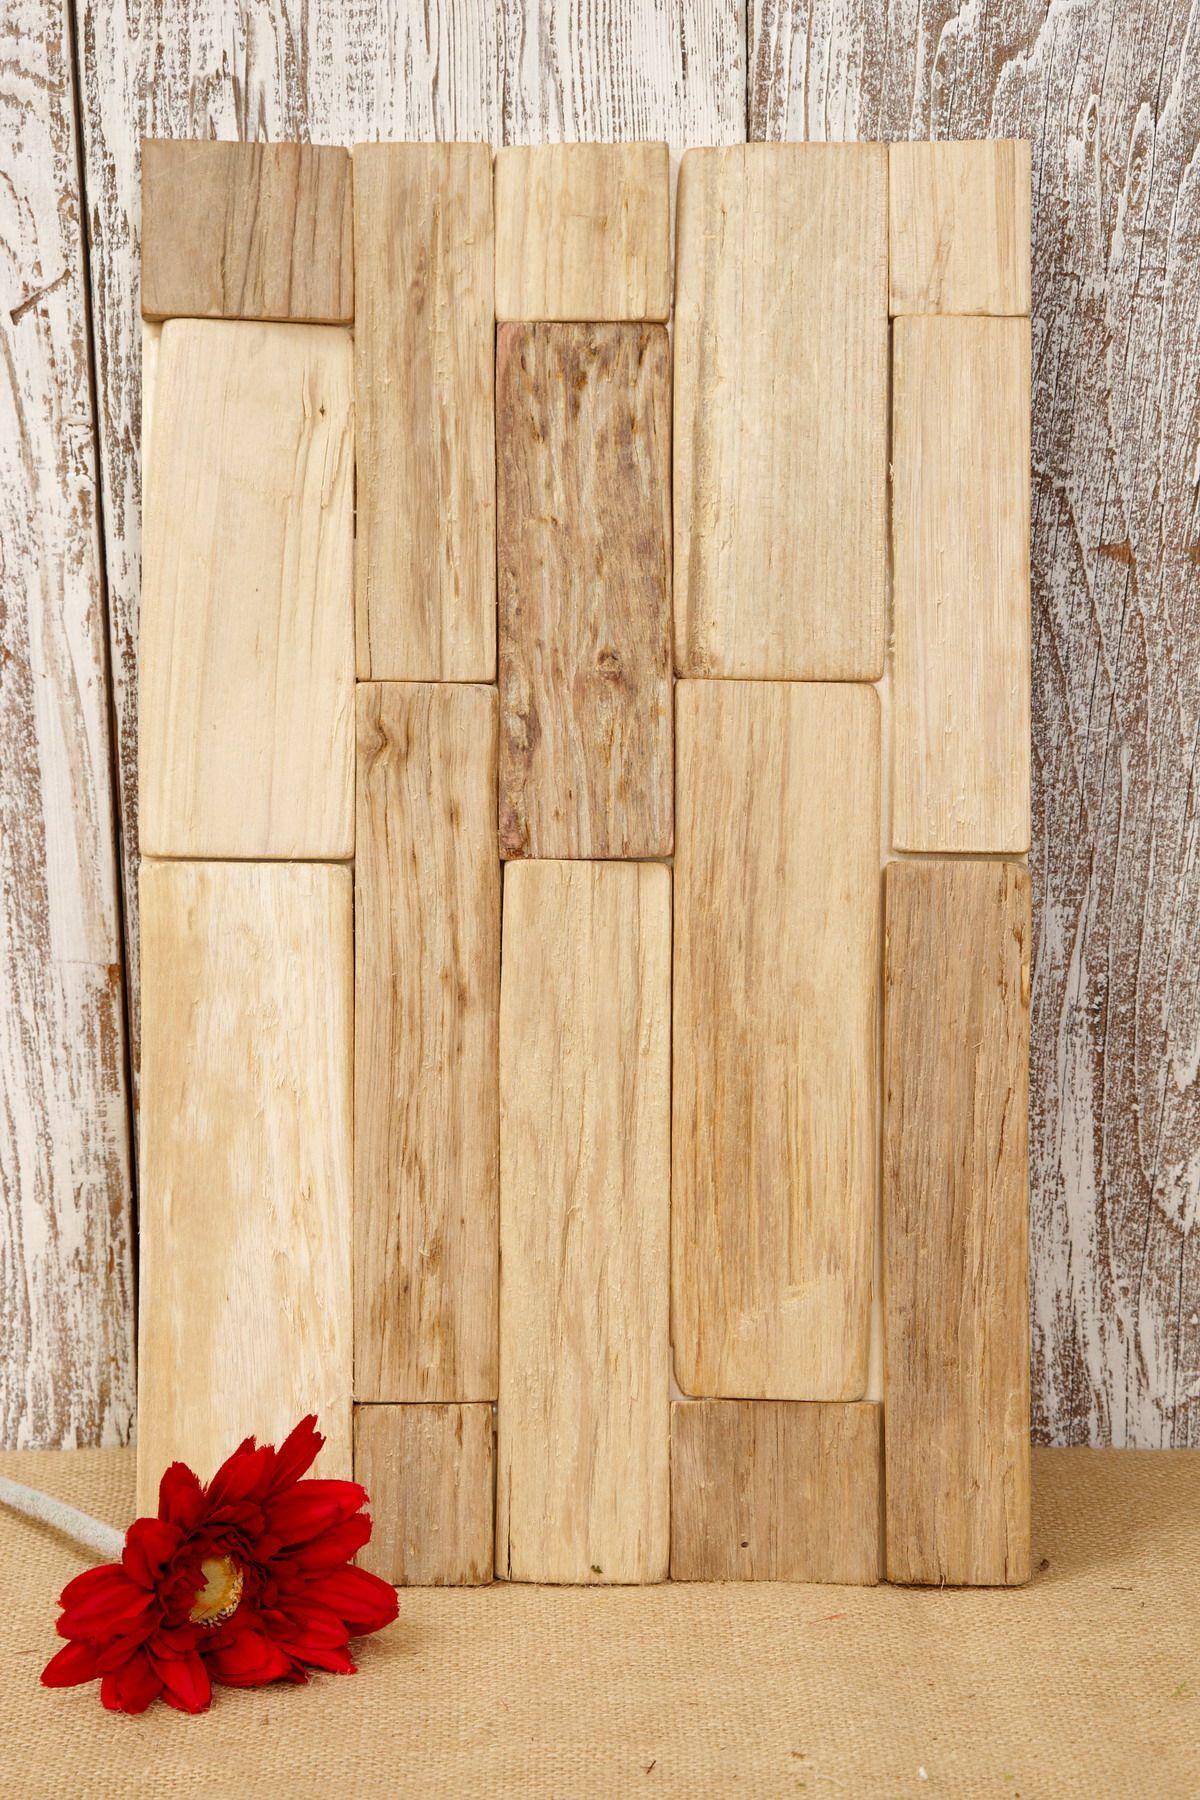 Hanging Driftwood Panel 15.75in | Beacy Bedroom | Pinterest ...